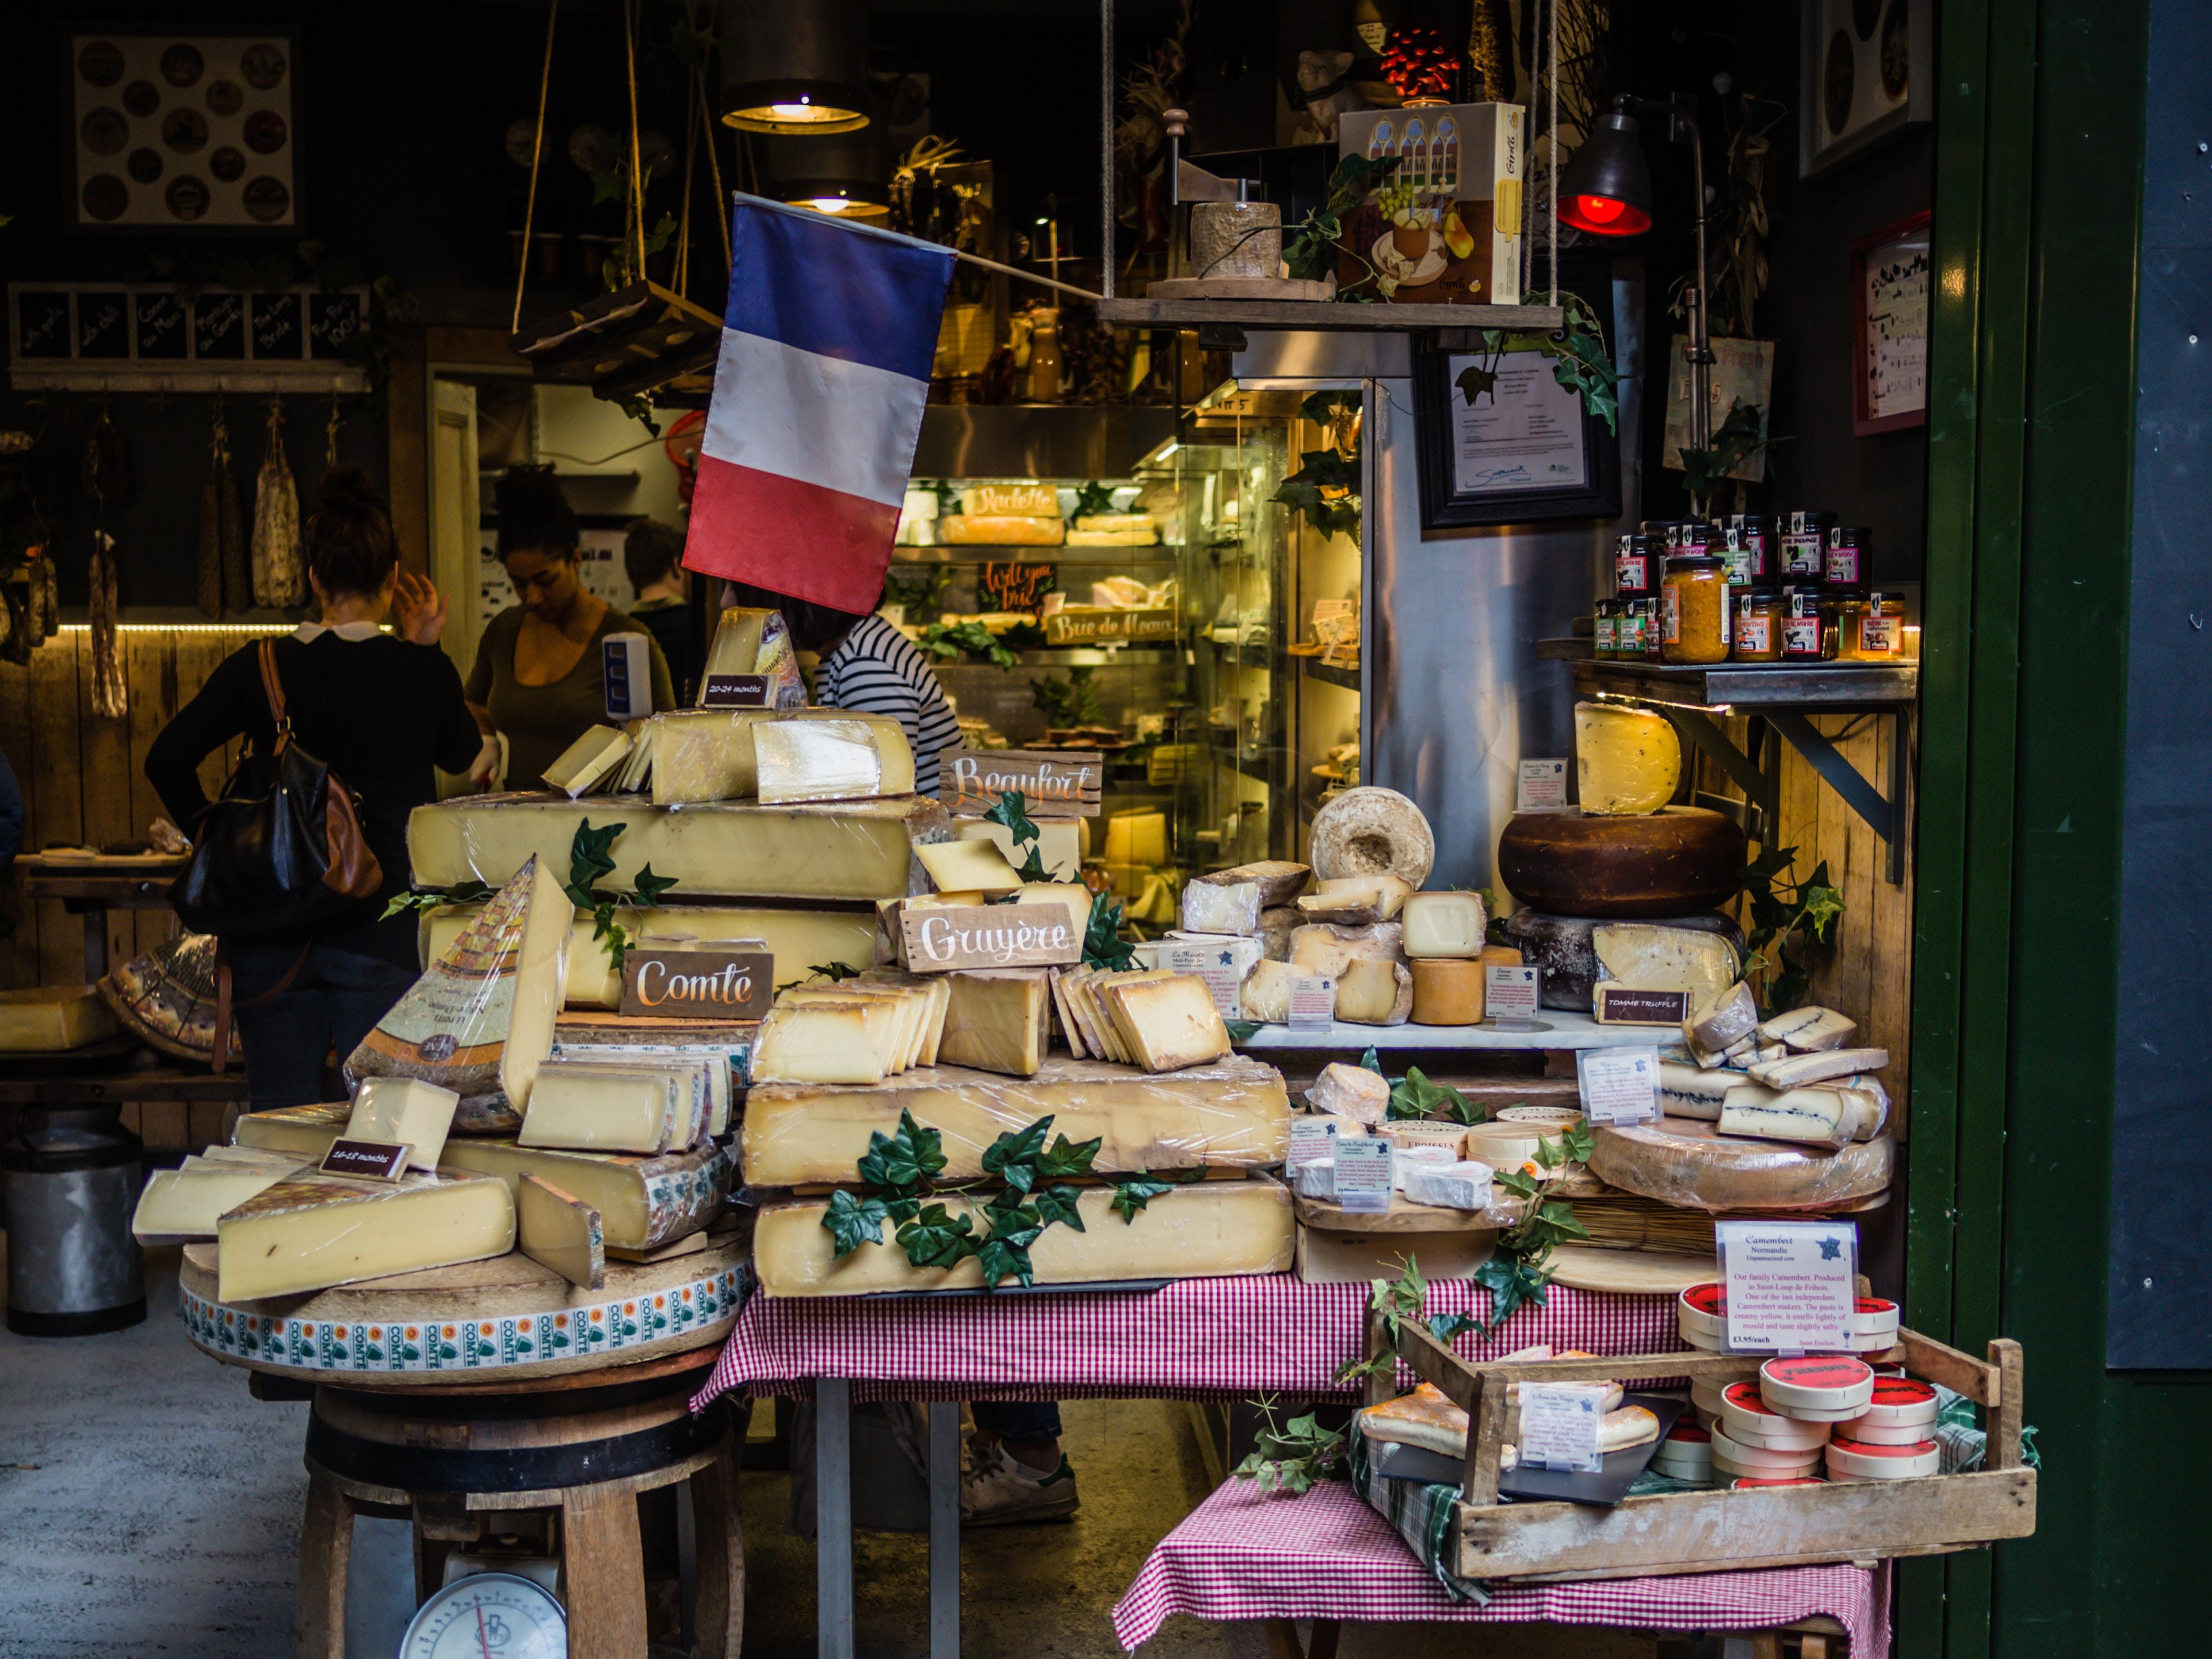 Wonen in Frankrijk